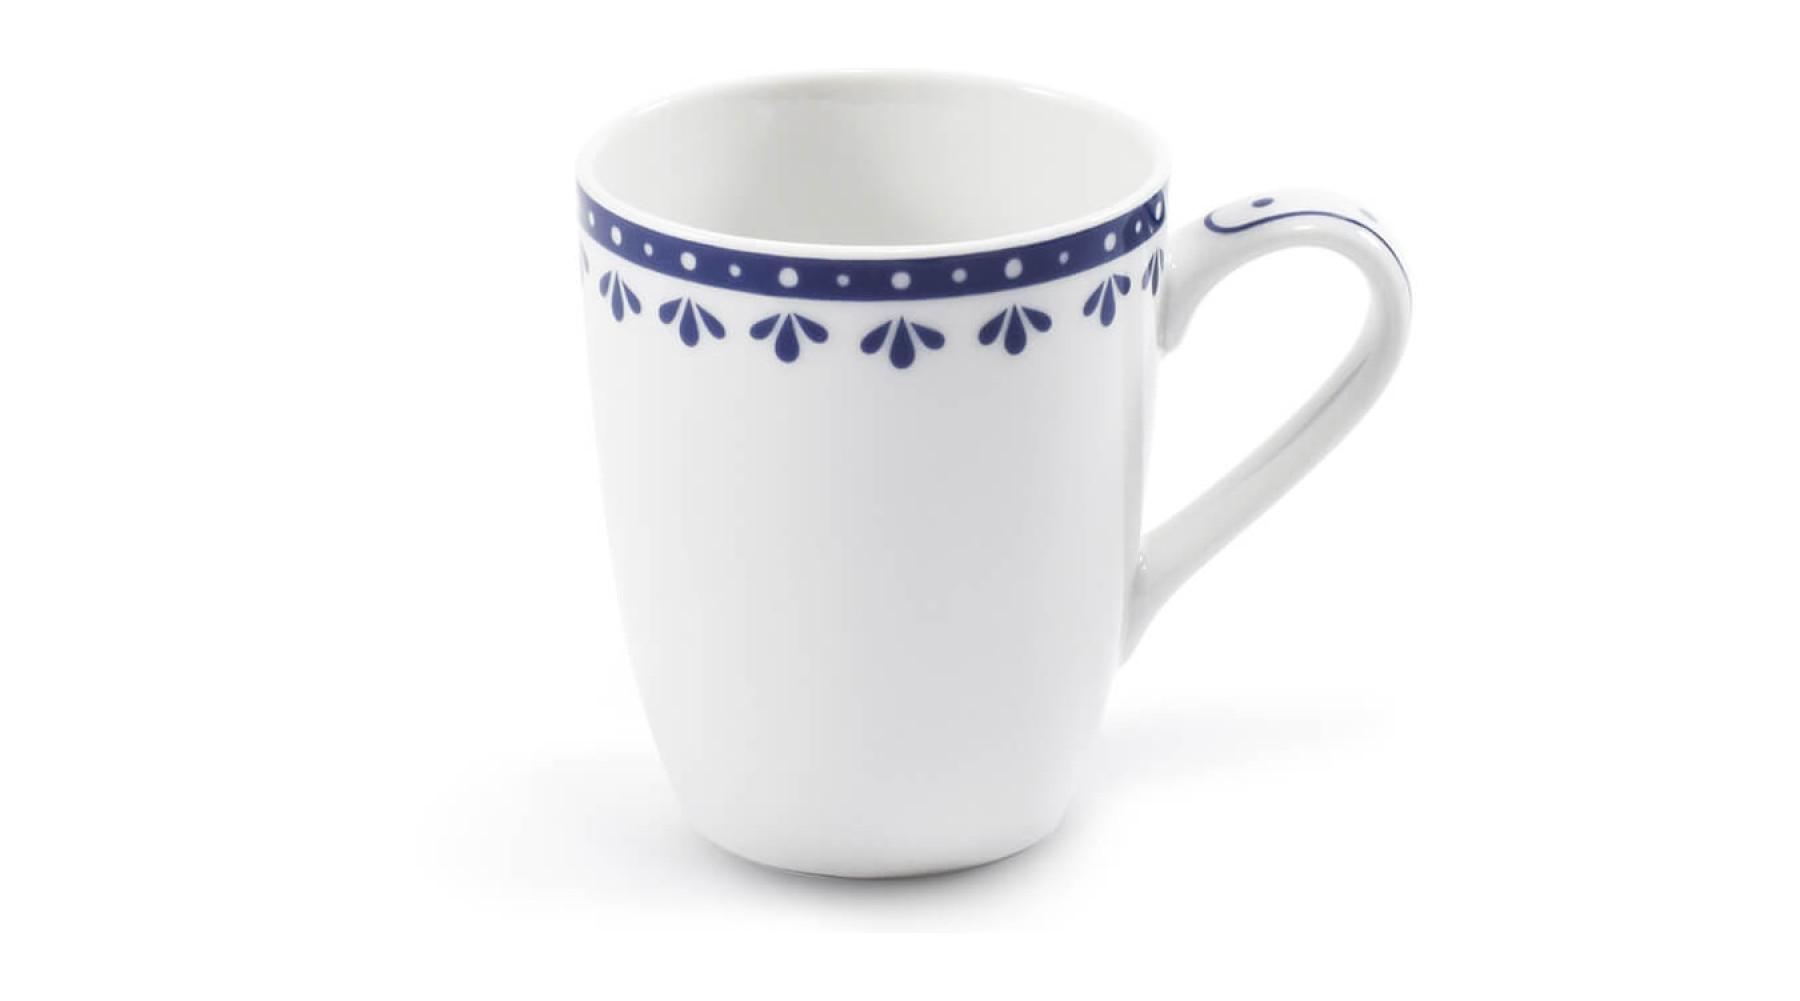 Šálek na espresso 0,09 l HyggeLine